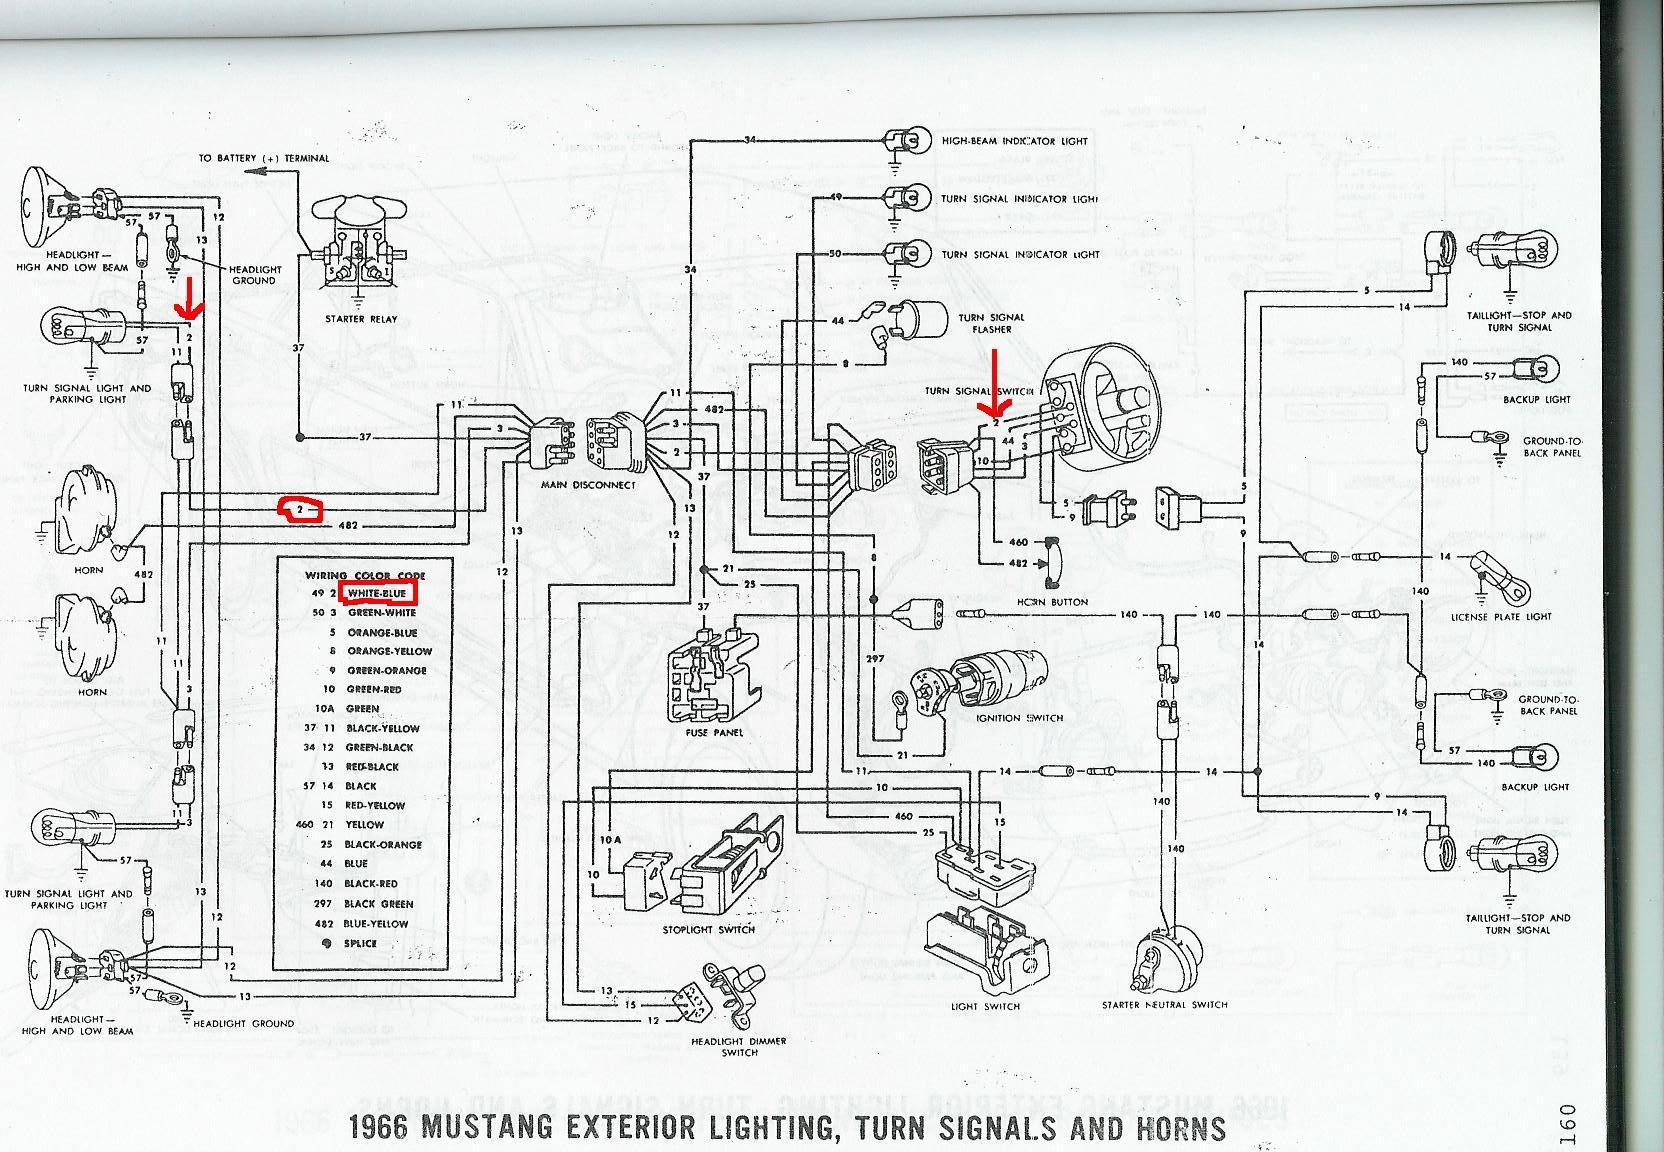 WW_2448] 1966 Mustang Back Up Light Wiring Download DiagramCular Geis Push Grebs Dogan Rele Mohammedshrine Librar Wiring 101